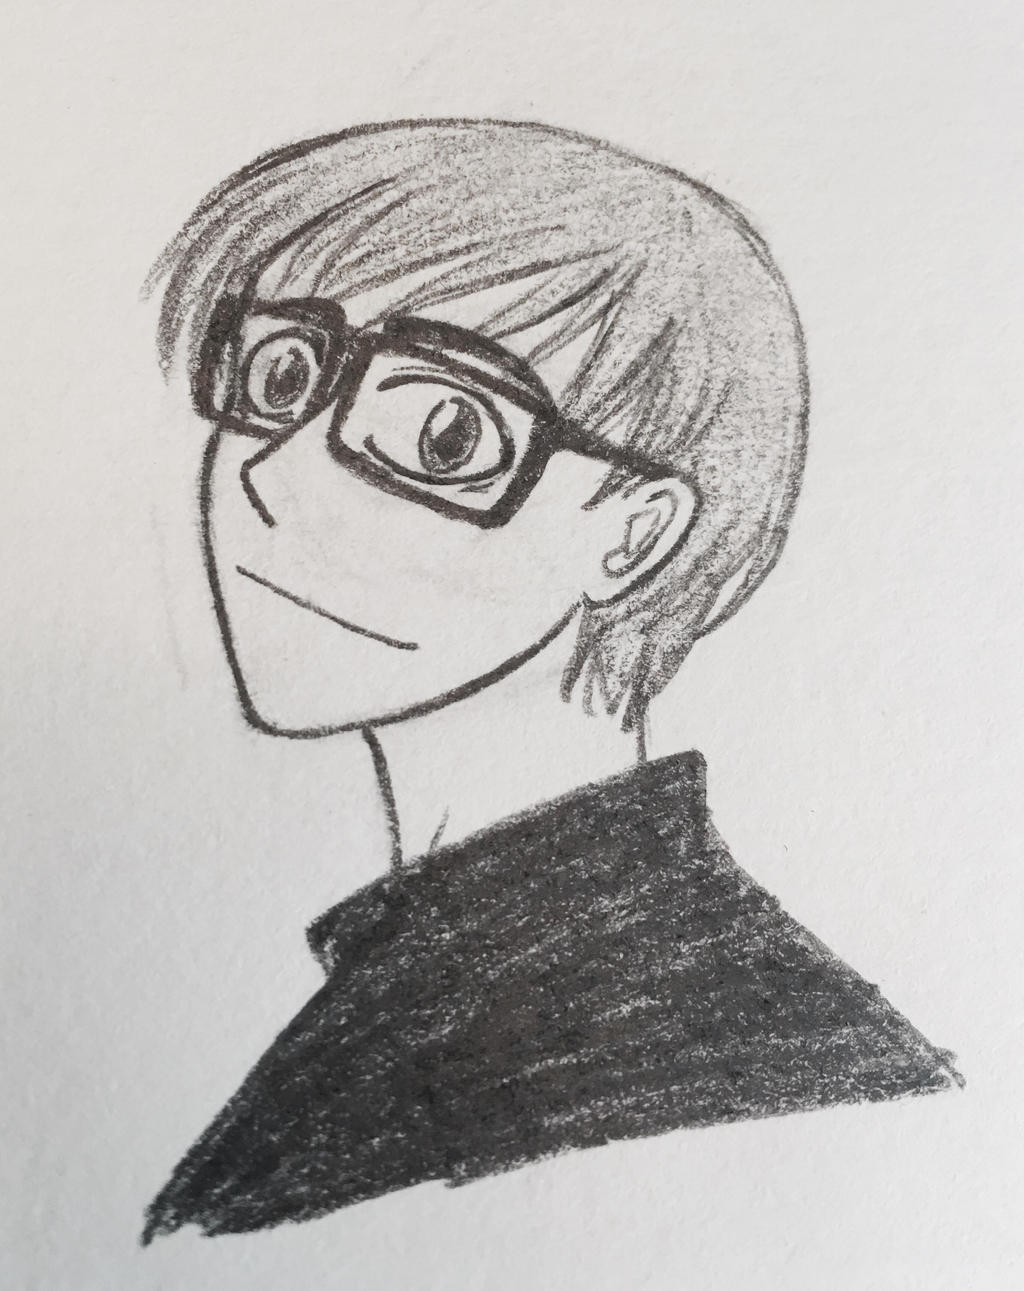 Ravens-of-Rome's Profile Picture